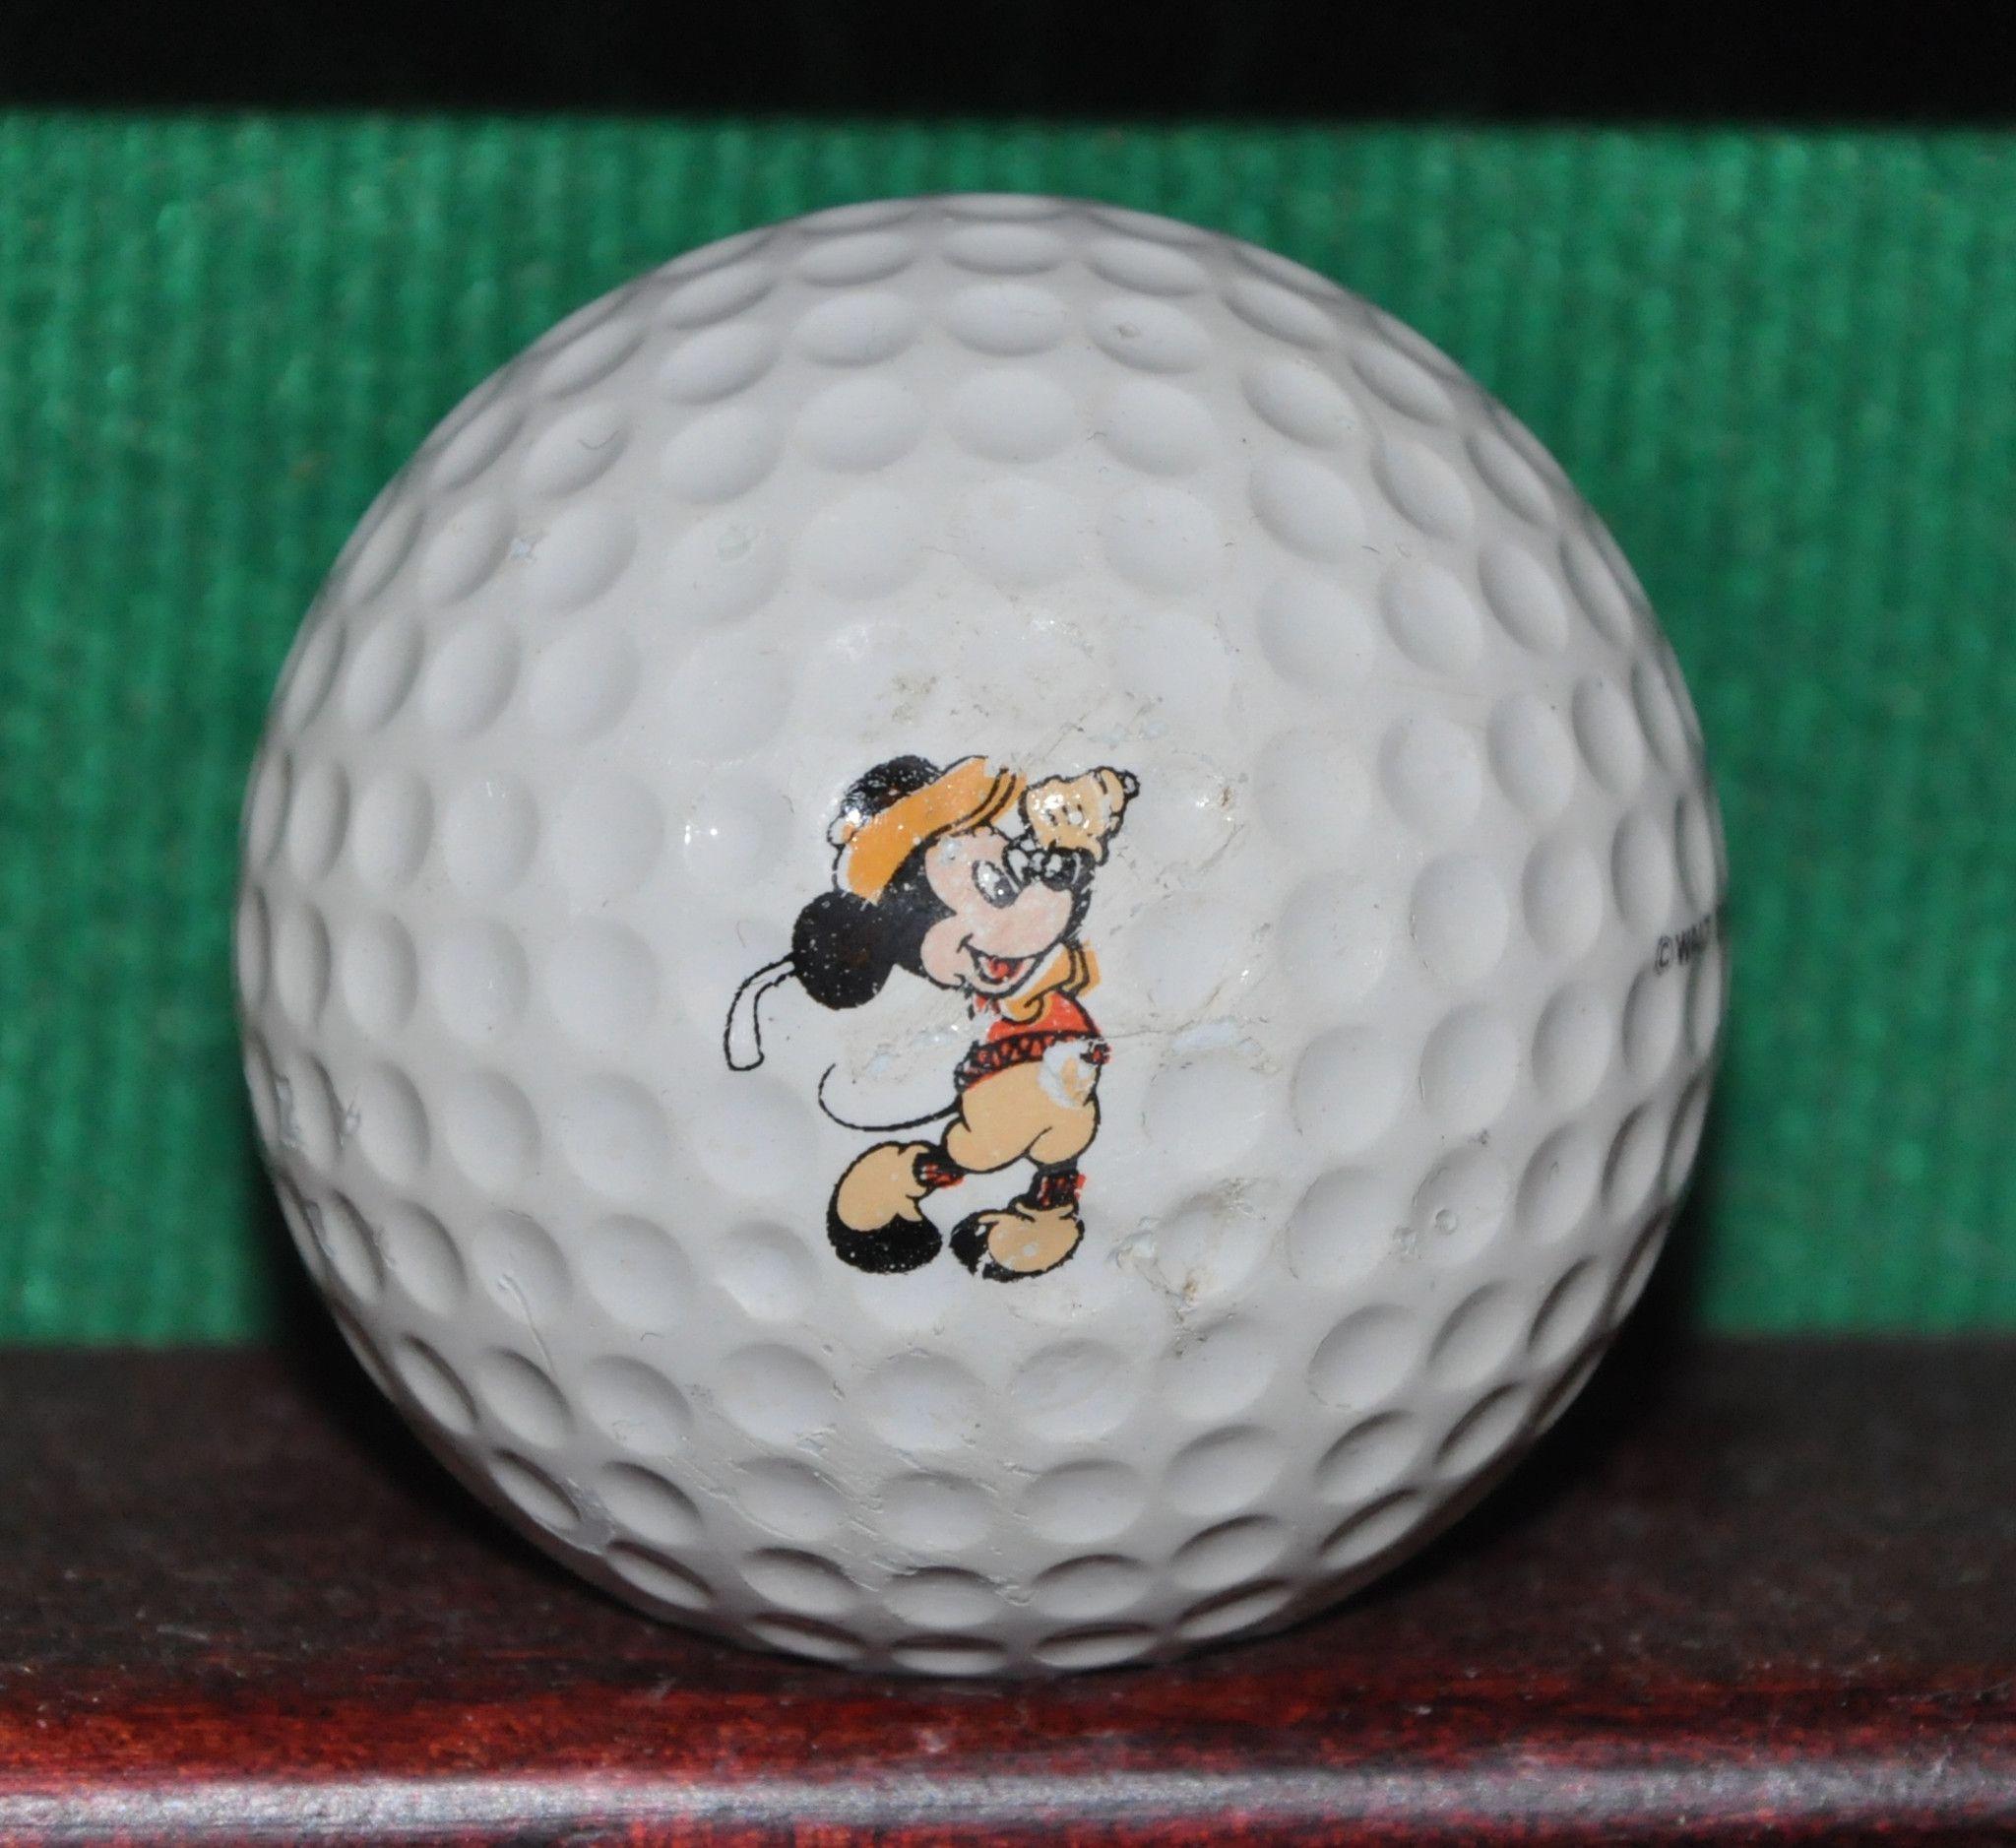 Vintage Walt Disney Mickey Mouse Logo Golf Ball Maxfli Walt Disney Mickey Mouse Golf Ball Disney Mickey Mouse